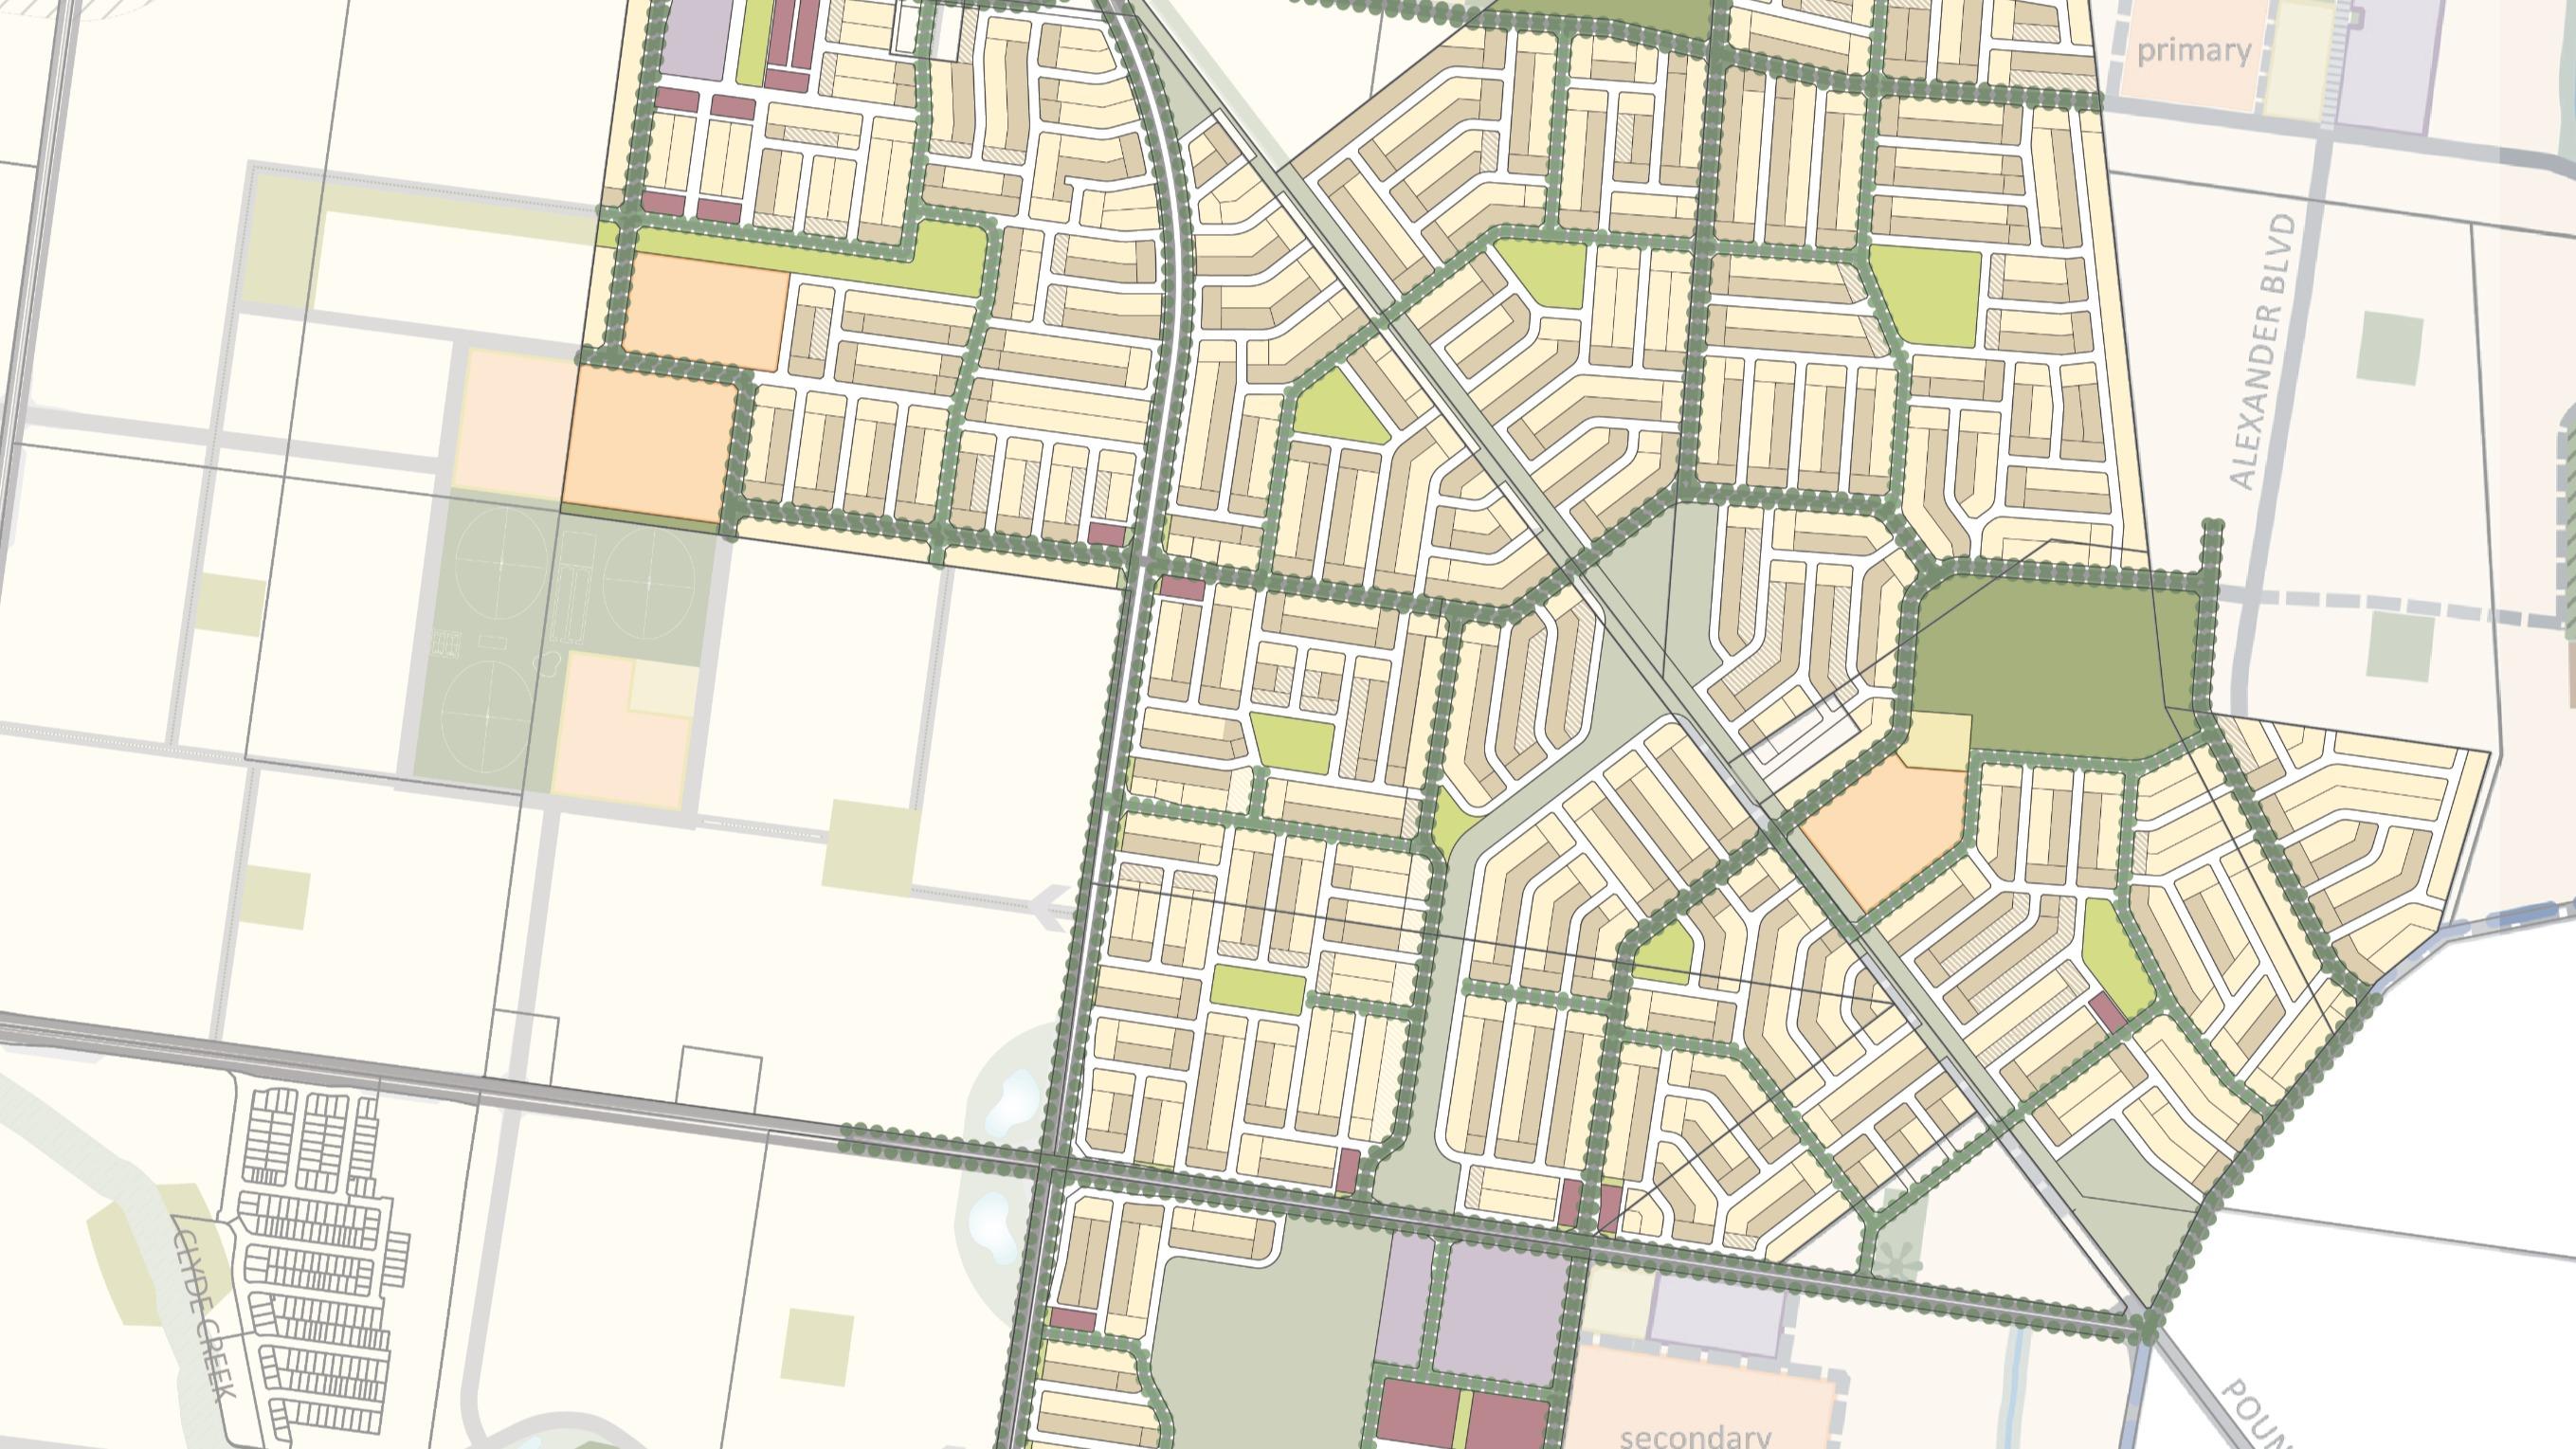 Greenfield Masterplan